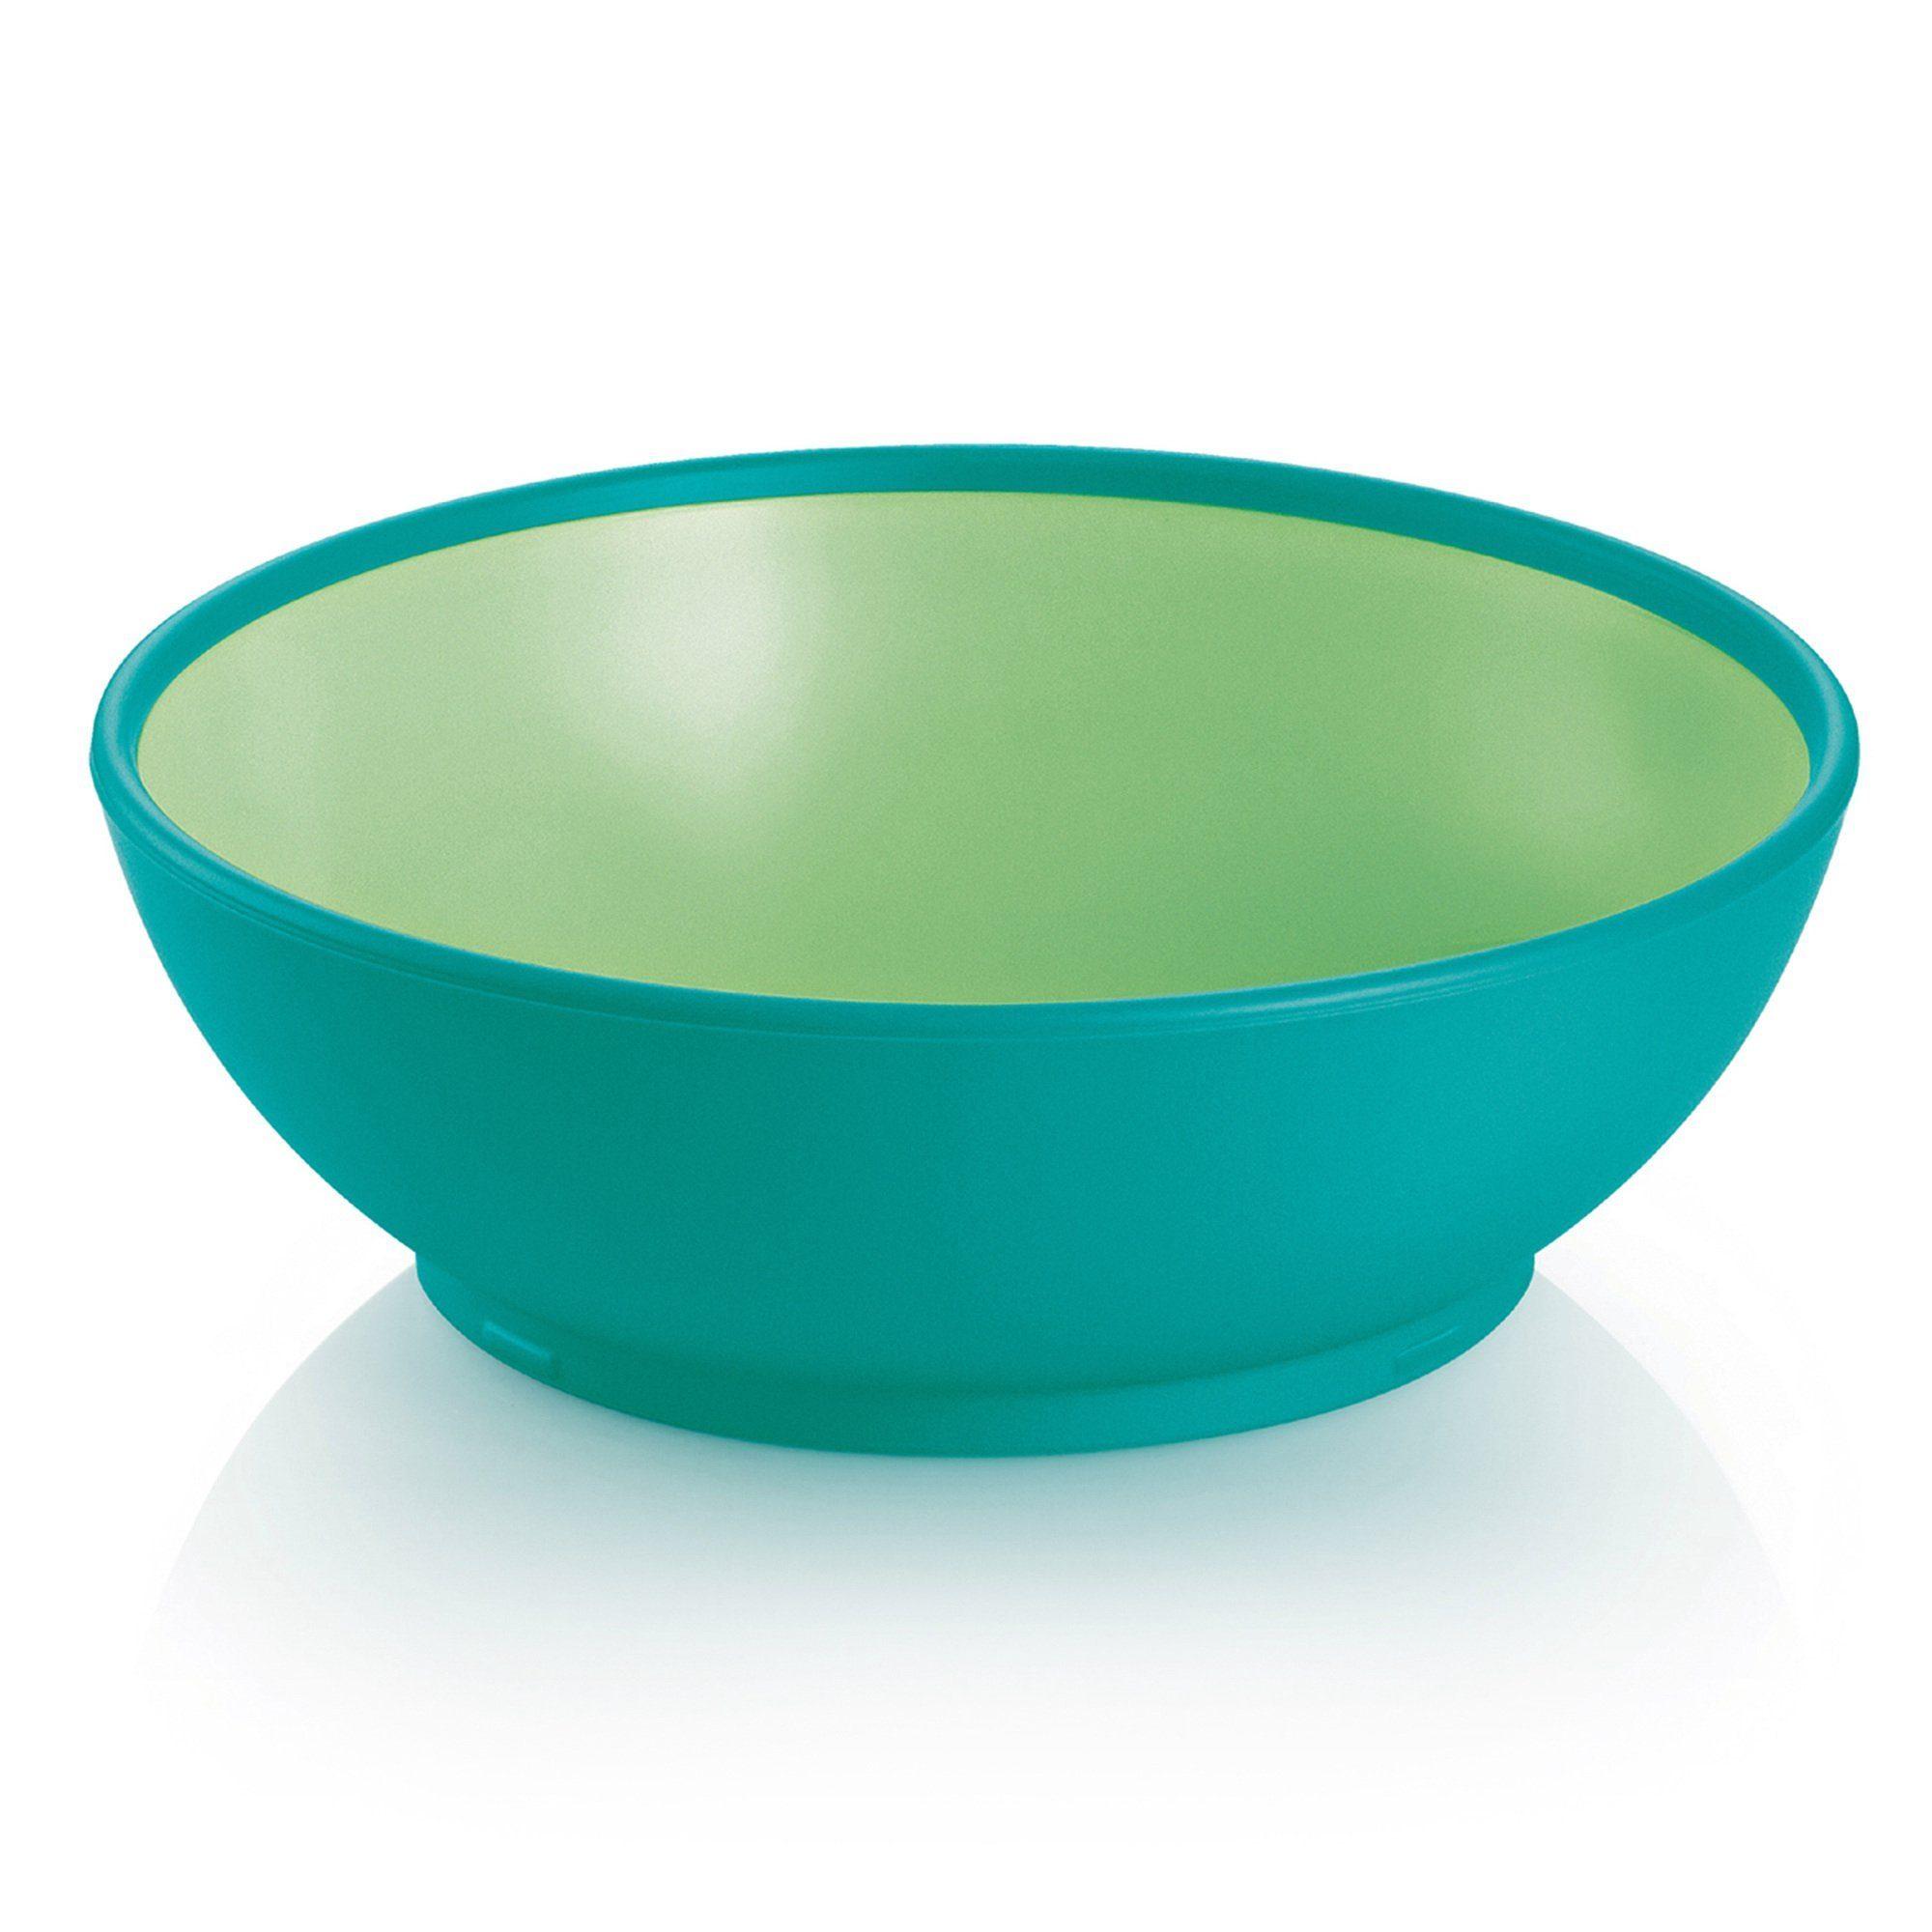 MAM Esslerngeschirr-Set Baby's Bowl & Plate